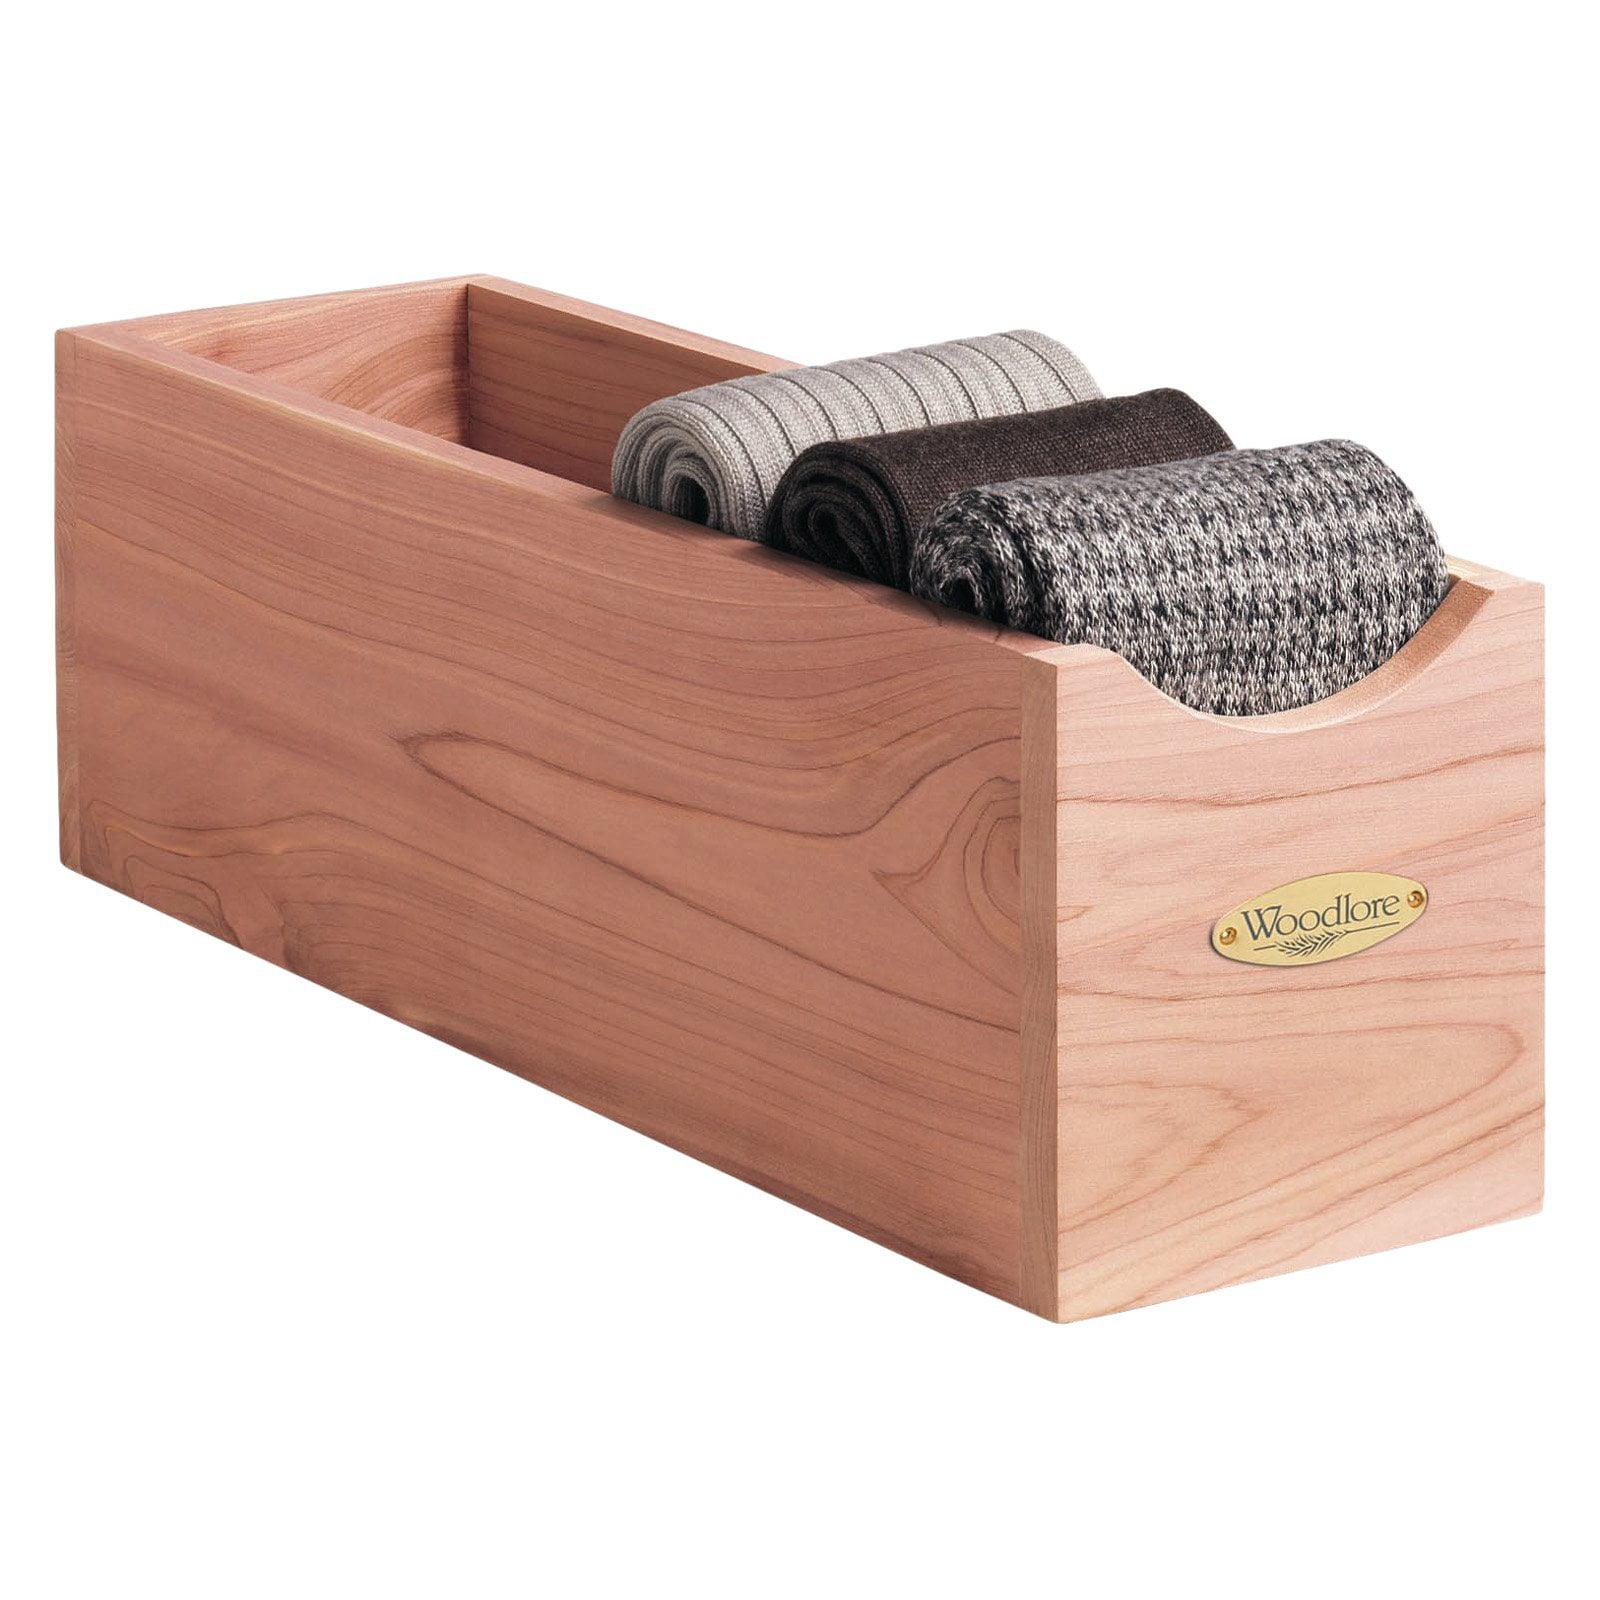 Woodlore Socks Box - Set of 2